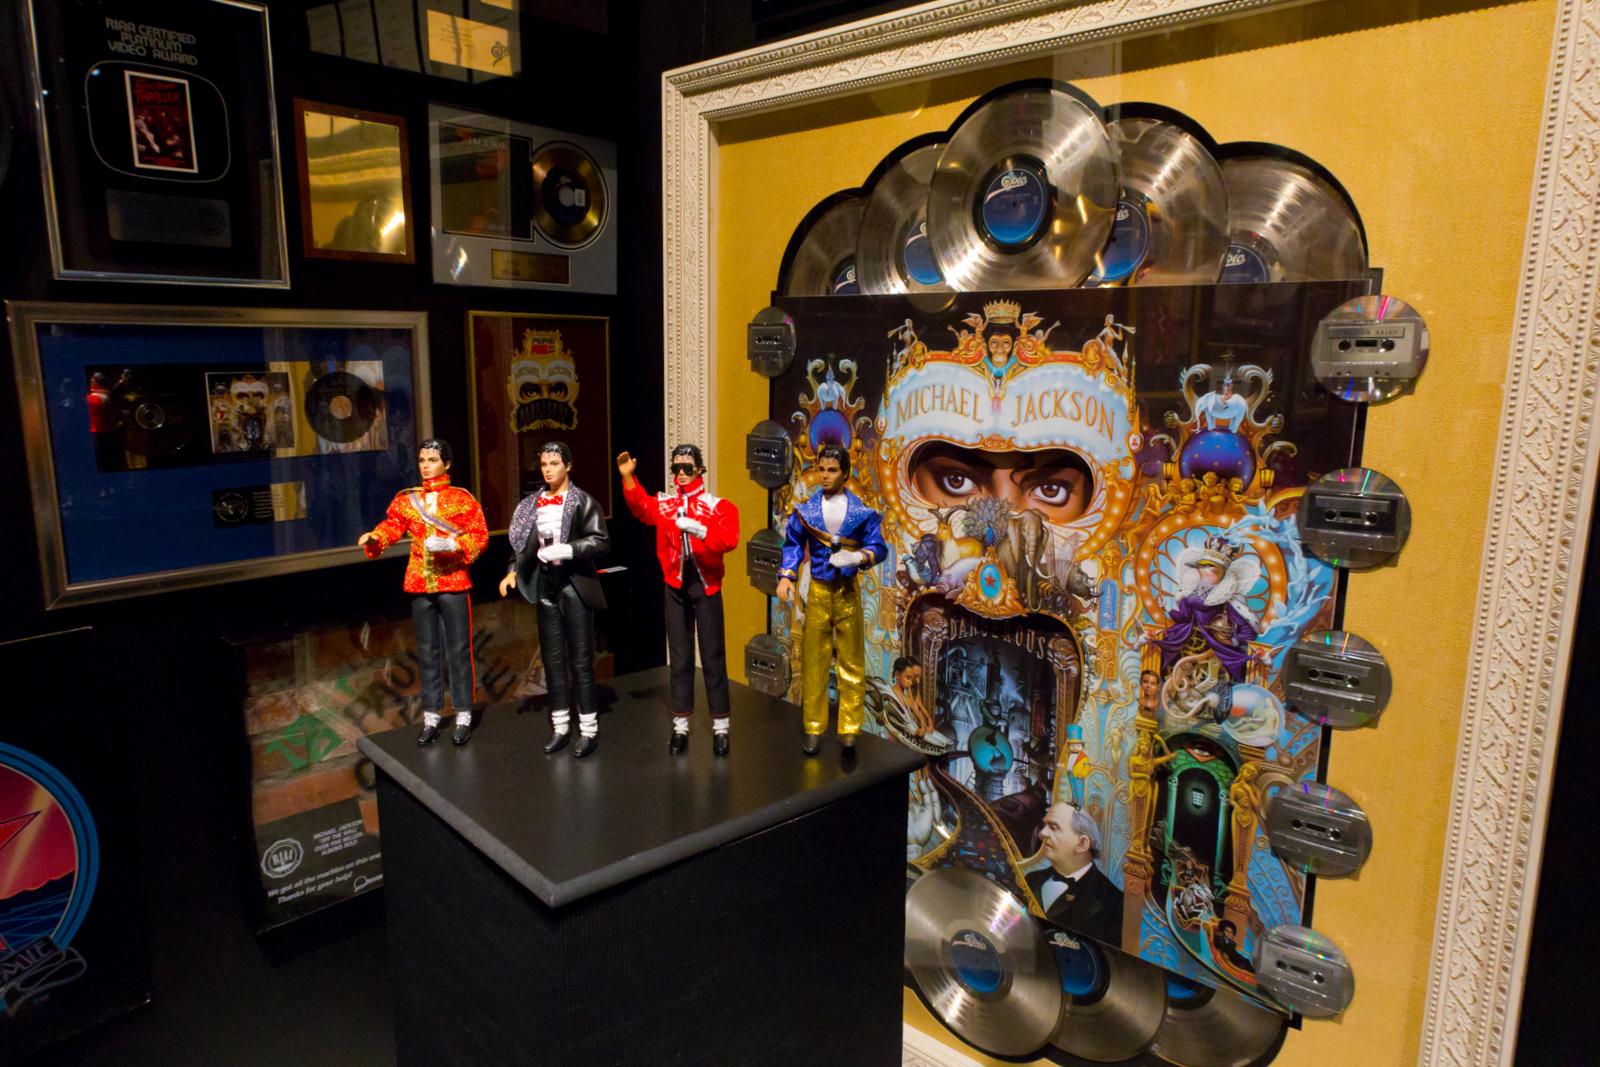 MJ dolls